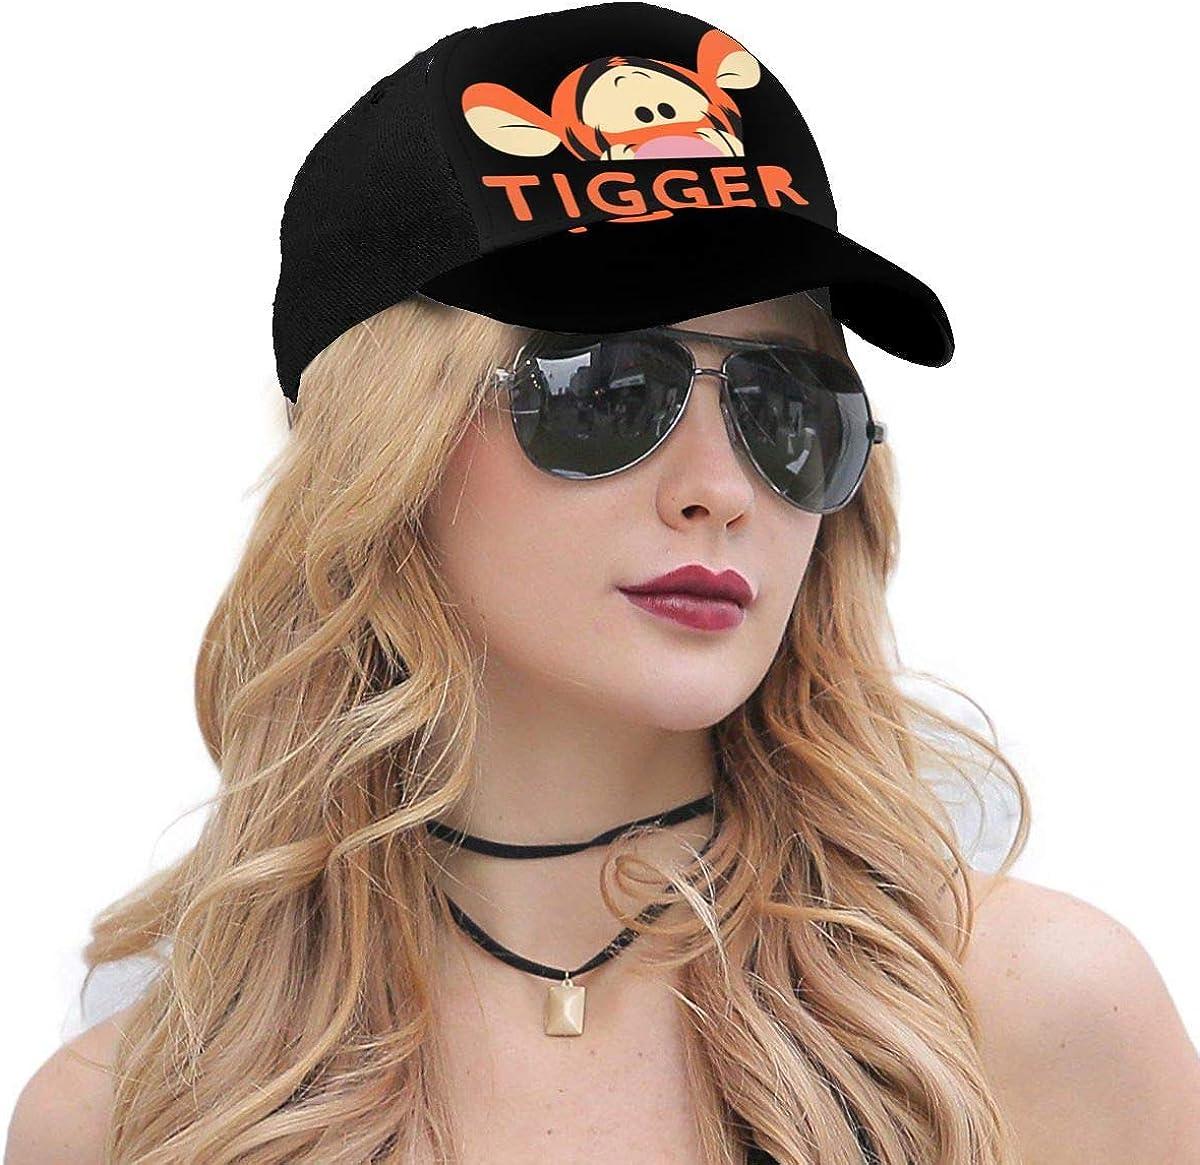 HJY-CUSTOM Win-nie The Pooh Peek A Boo/_Tigger Twill Adjustable Vintage Unisex Summer Baseball Hats for Men Black